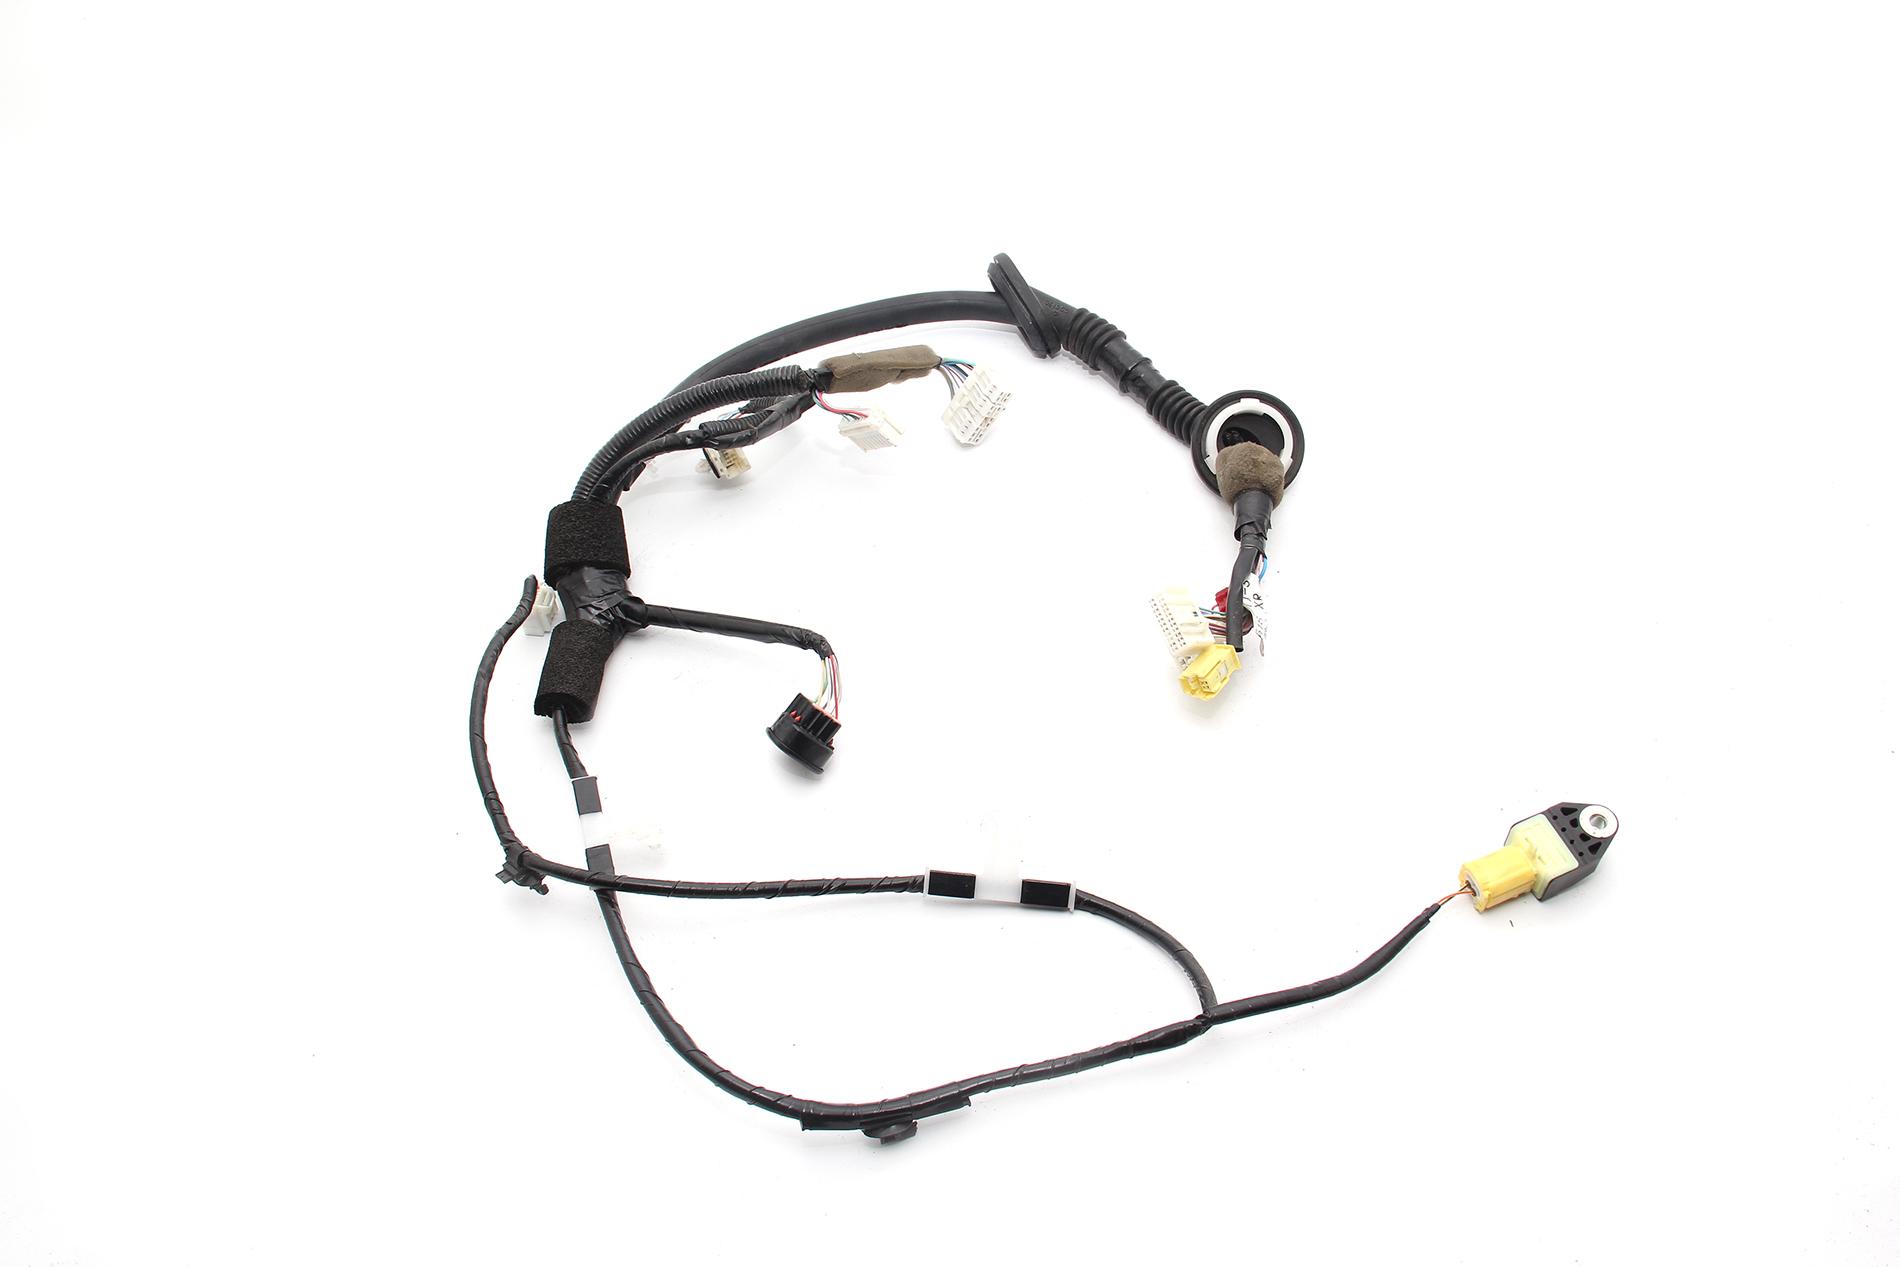 Scion Fr S Frs Front Door Wire Harness Left Driver Su003